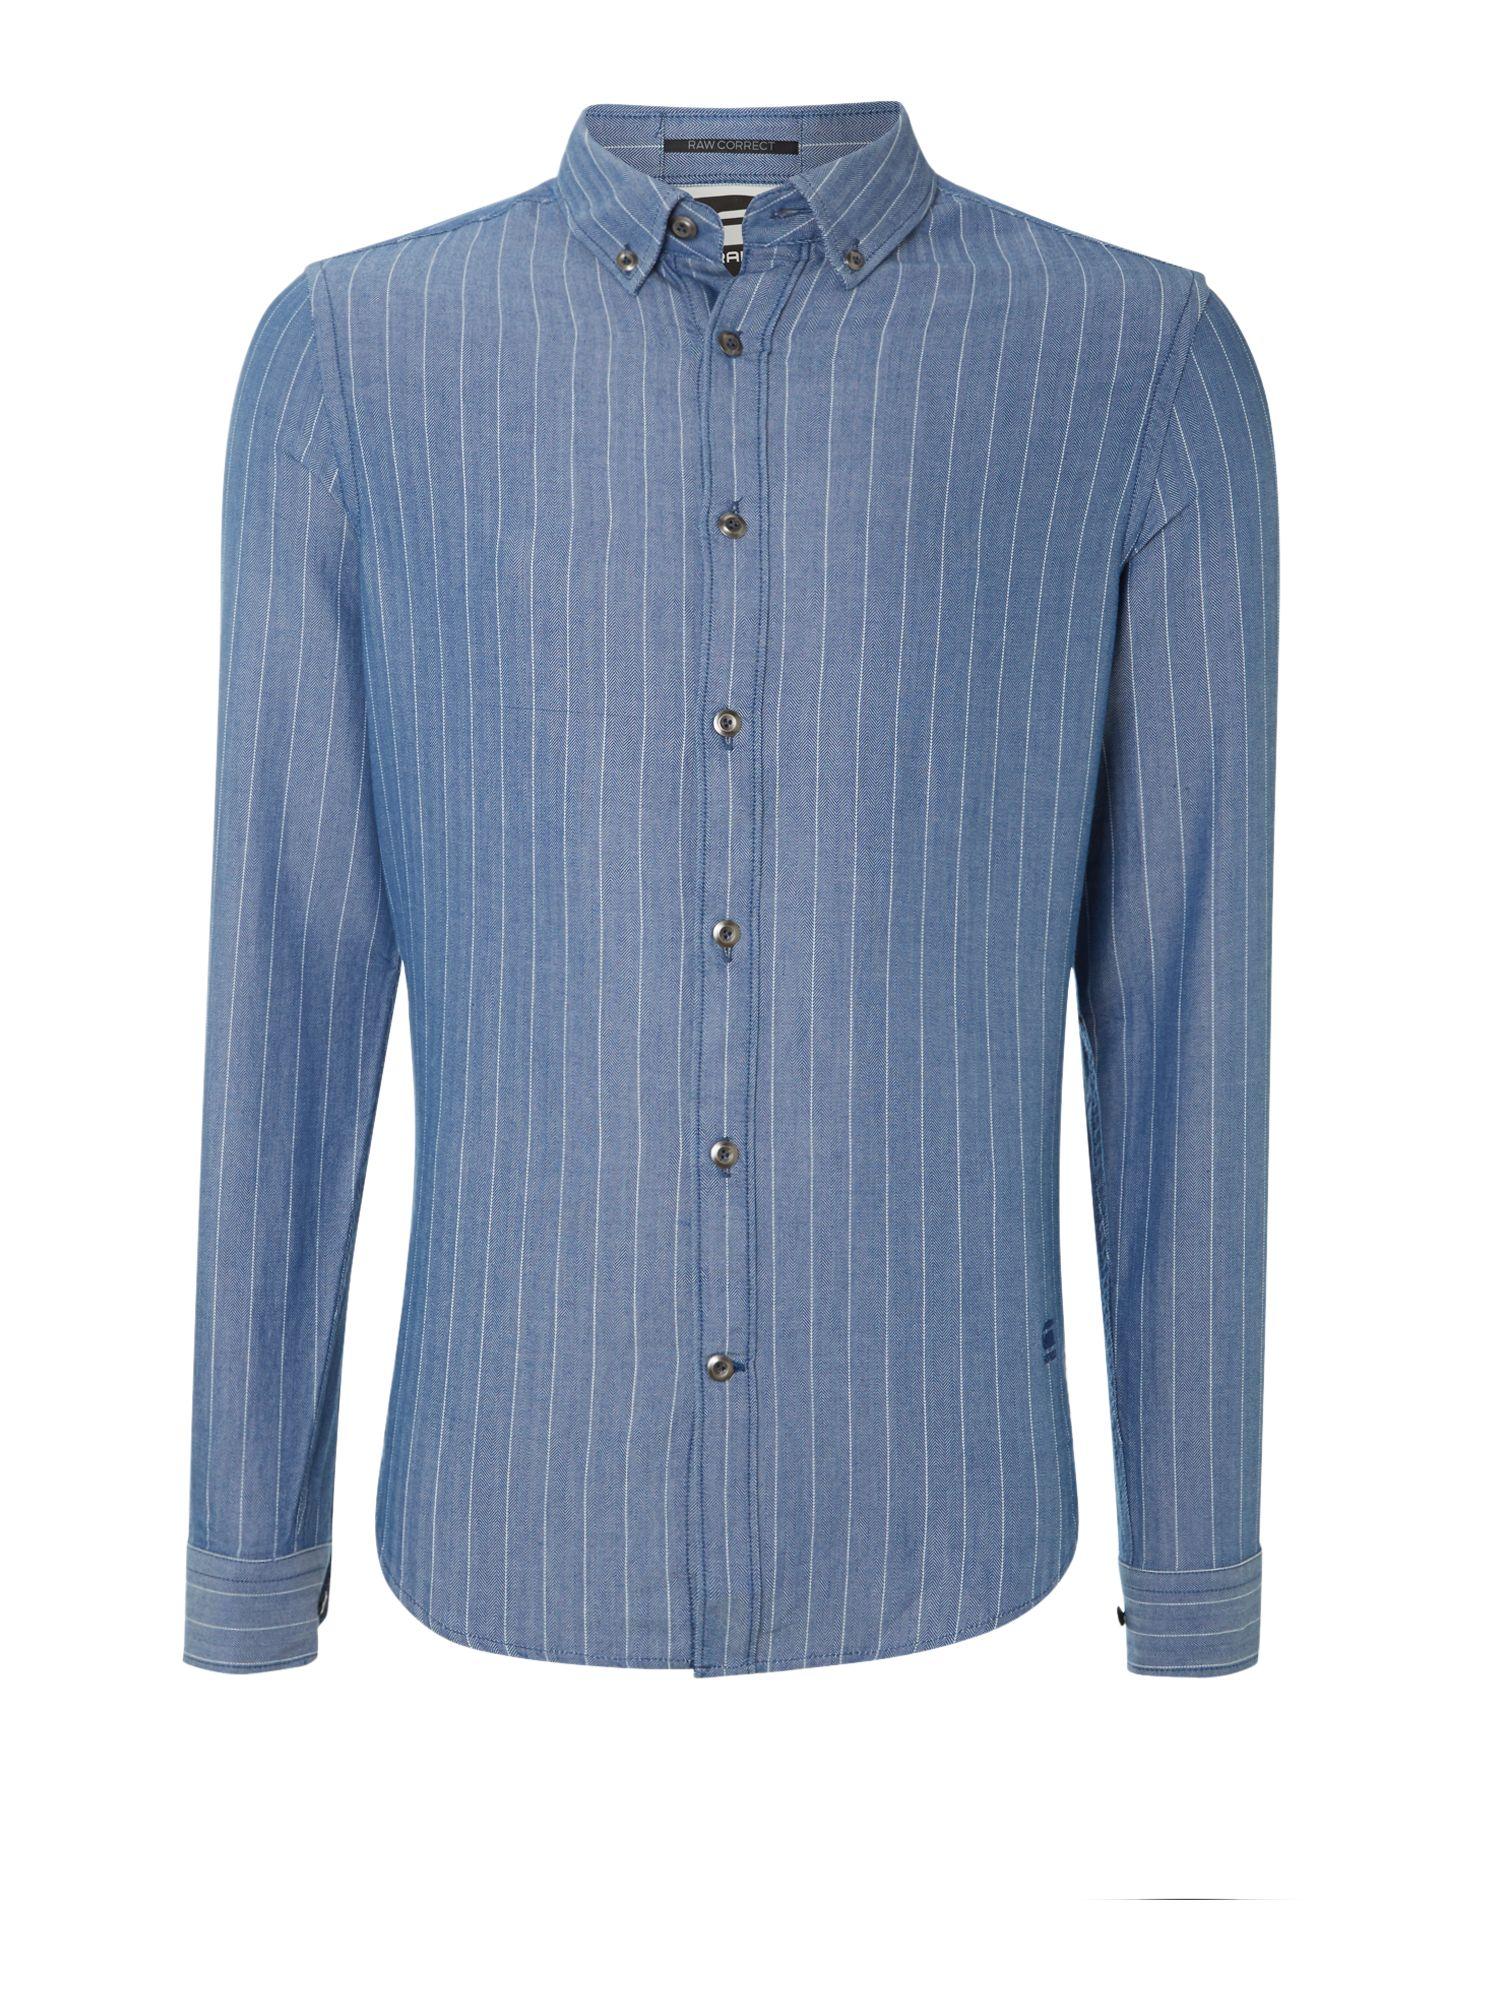 g star raw vertical line textured shirt in blue for men lyst. Black Bedroom Furniture Sets. Home Design Ideas